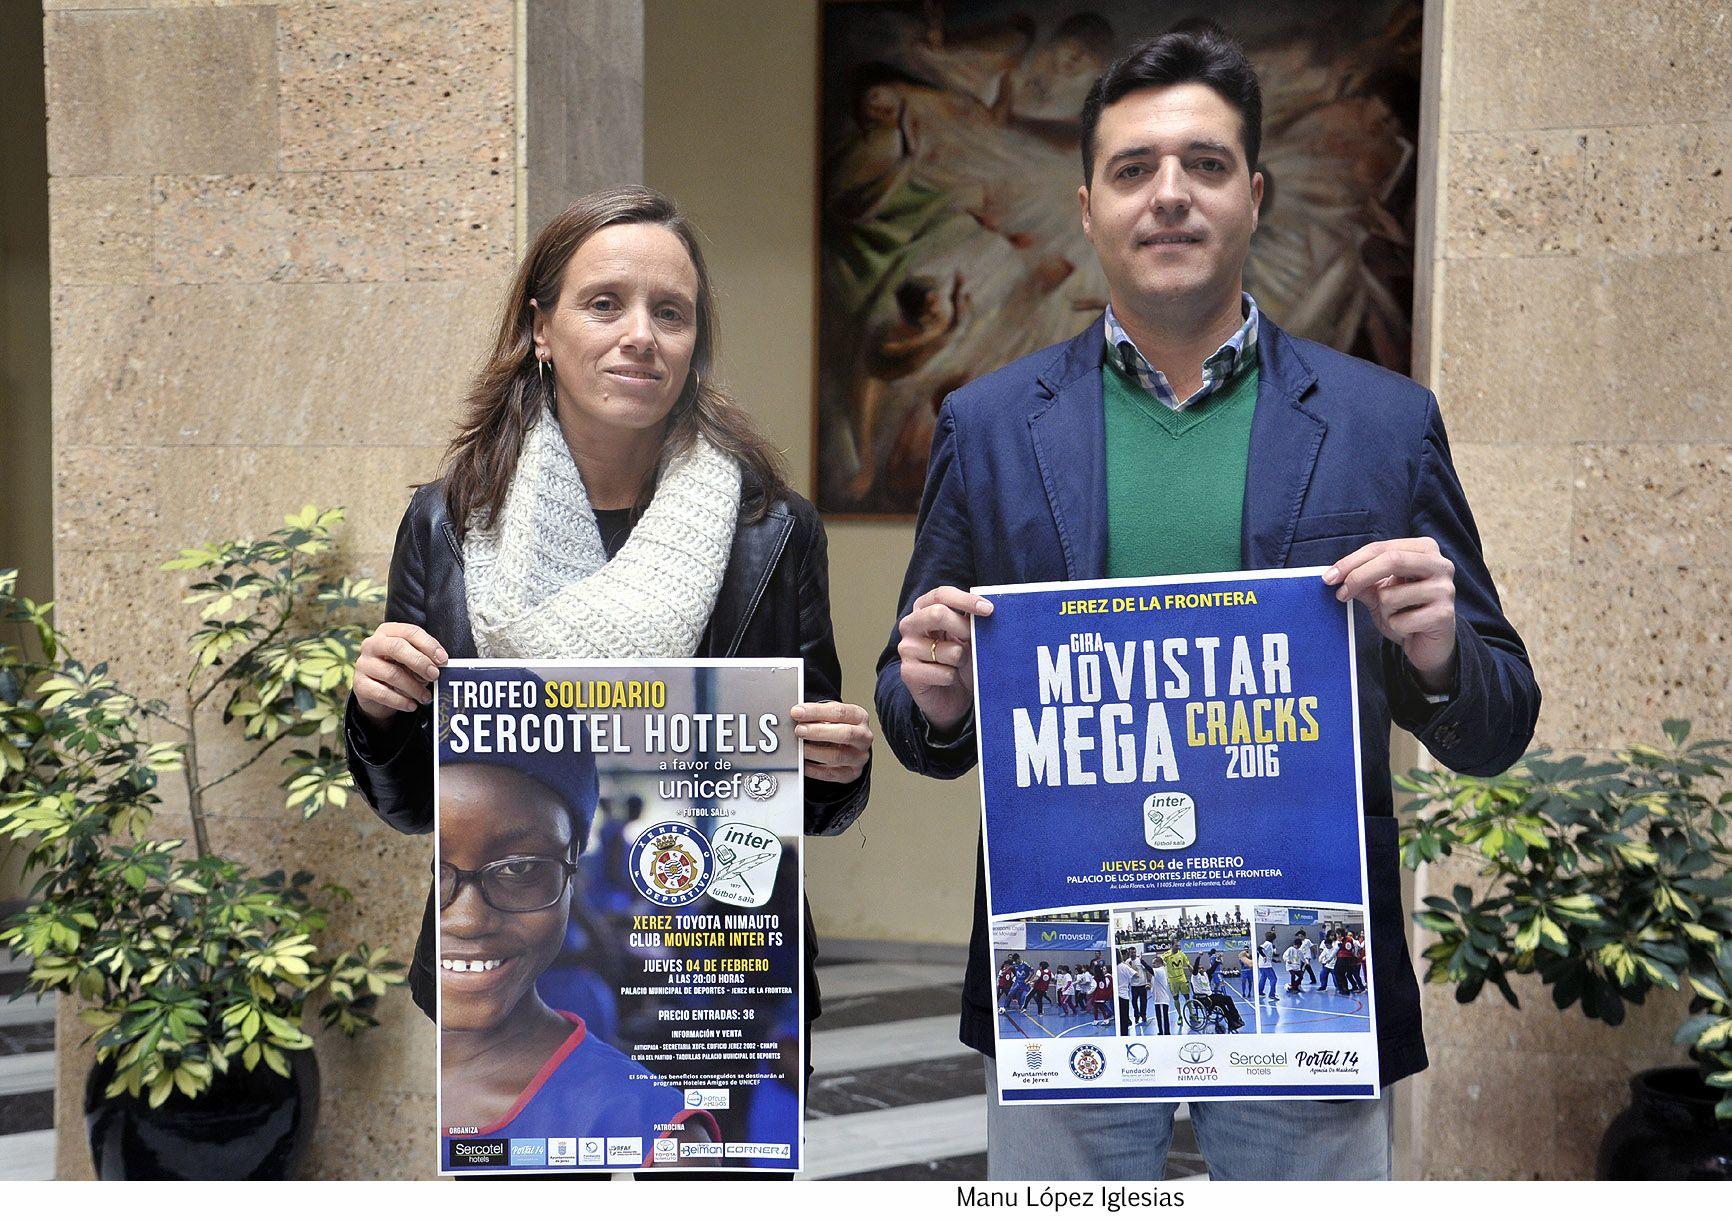 Laura Alvarez pres Gira Movistar Megacracks